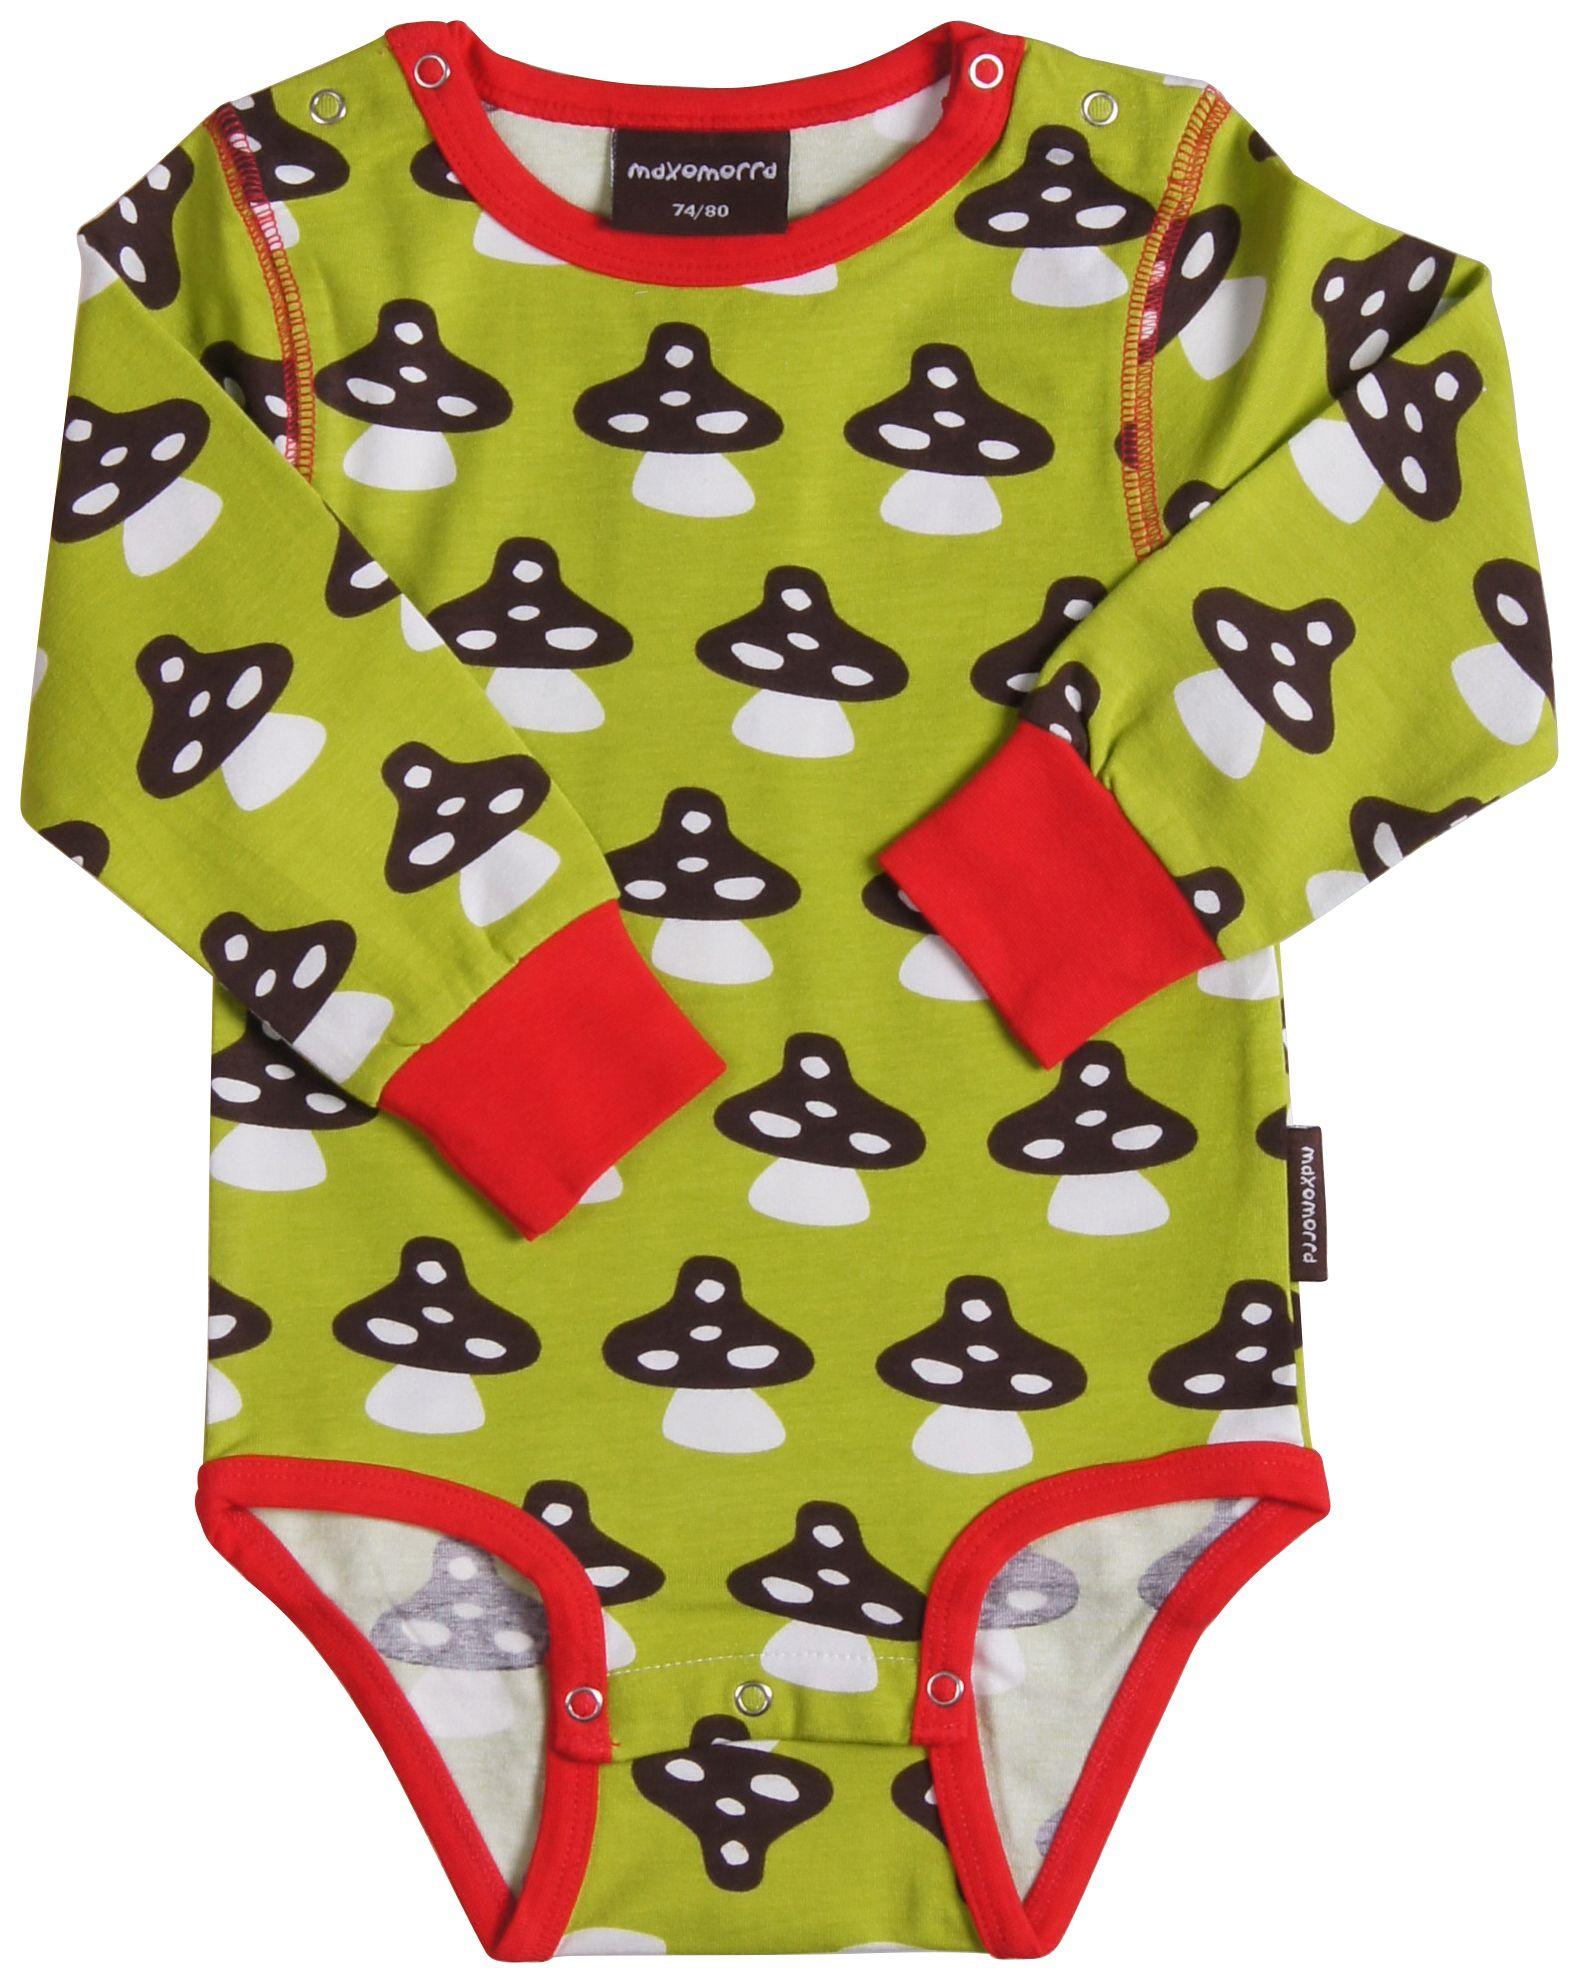 Maxomorra Red Unisex Baby Organic Cotton Regular Shorts